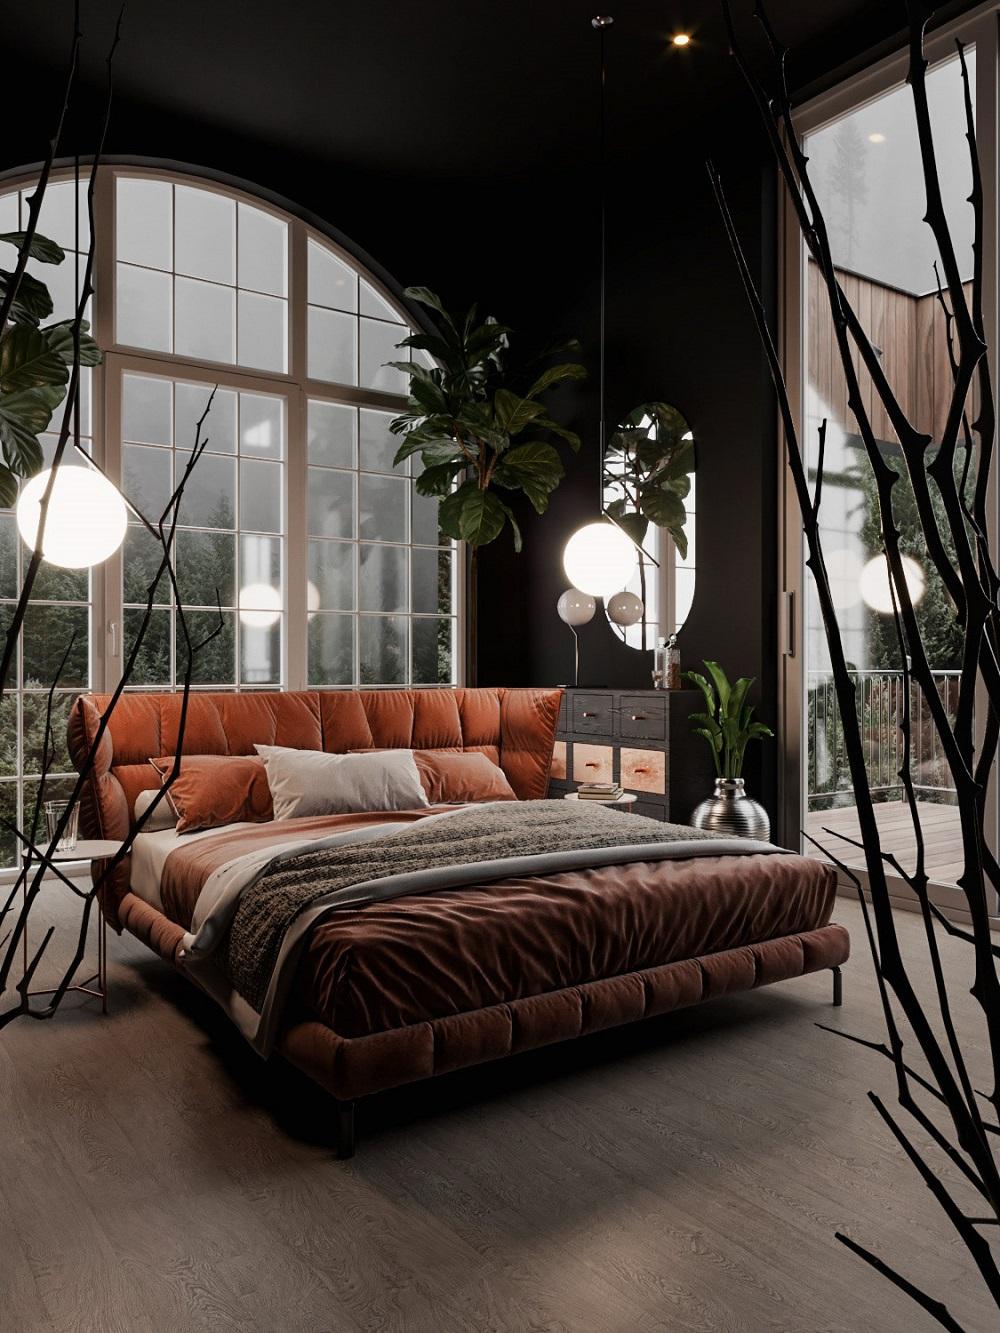 Impressive arched window in a black bedroom   visualisation by Marcin Kasperski